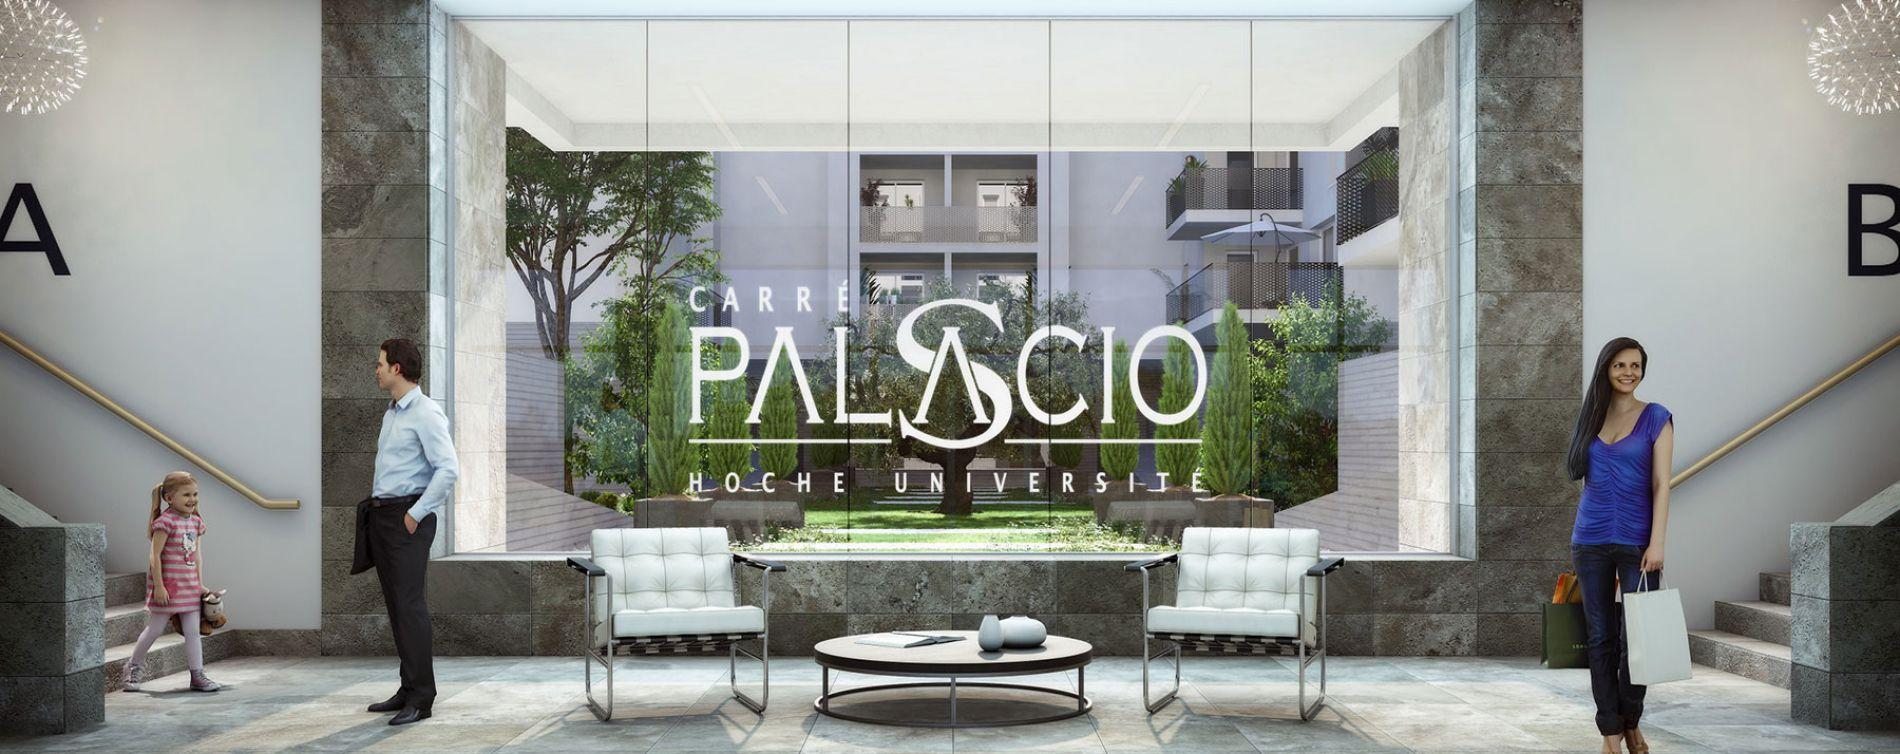 Résidence Carré Palascio à Nîmes